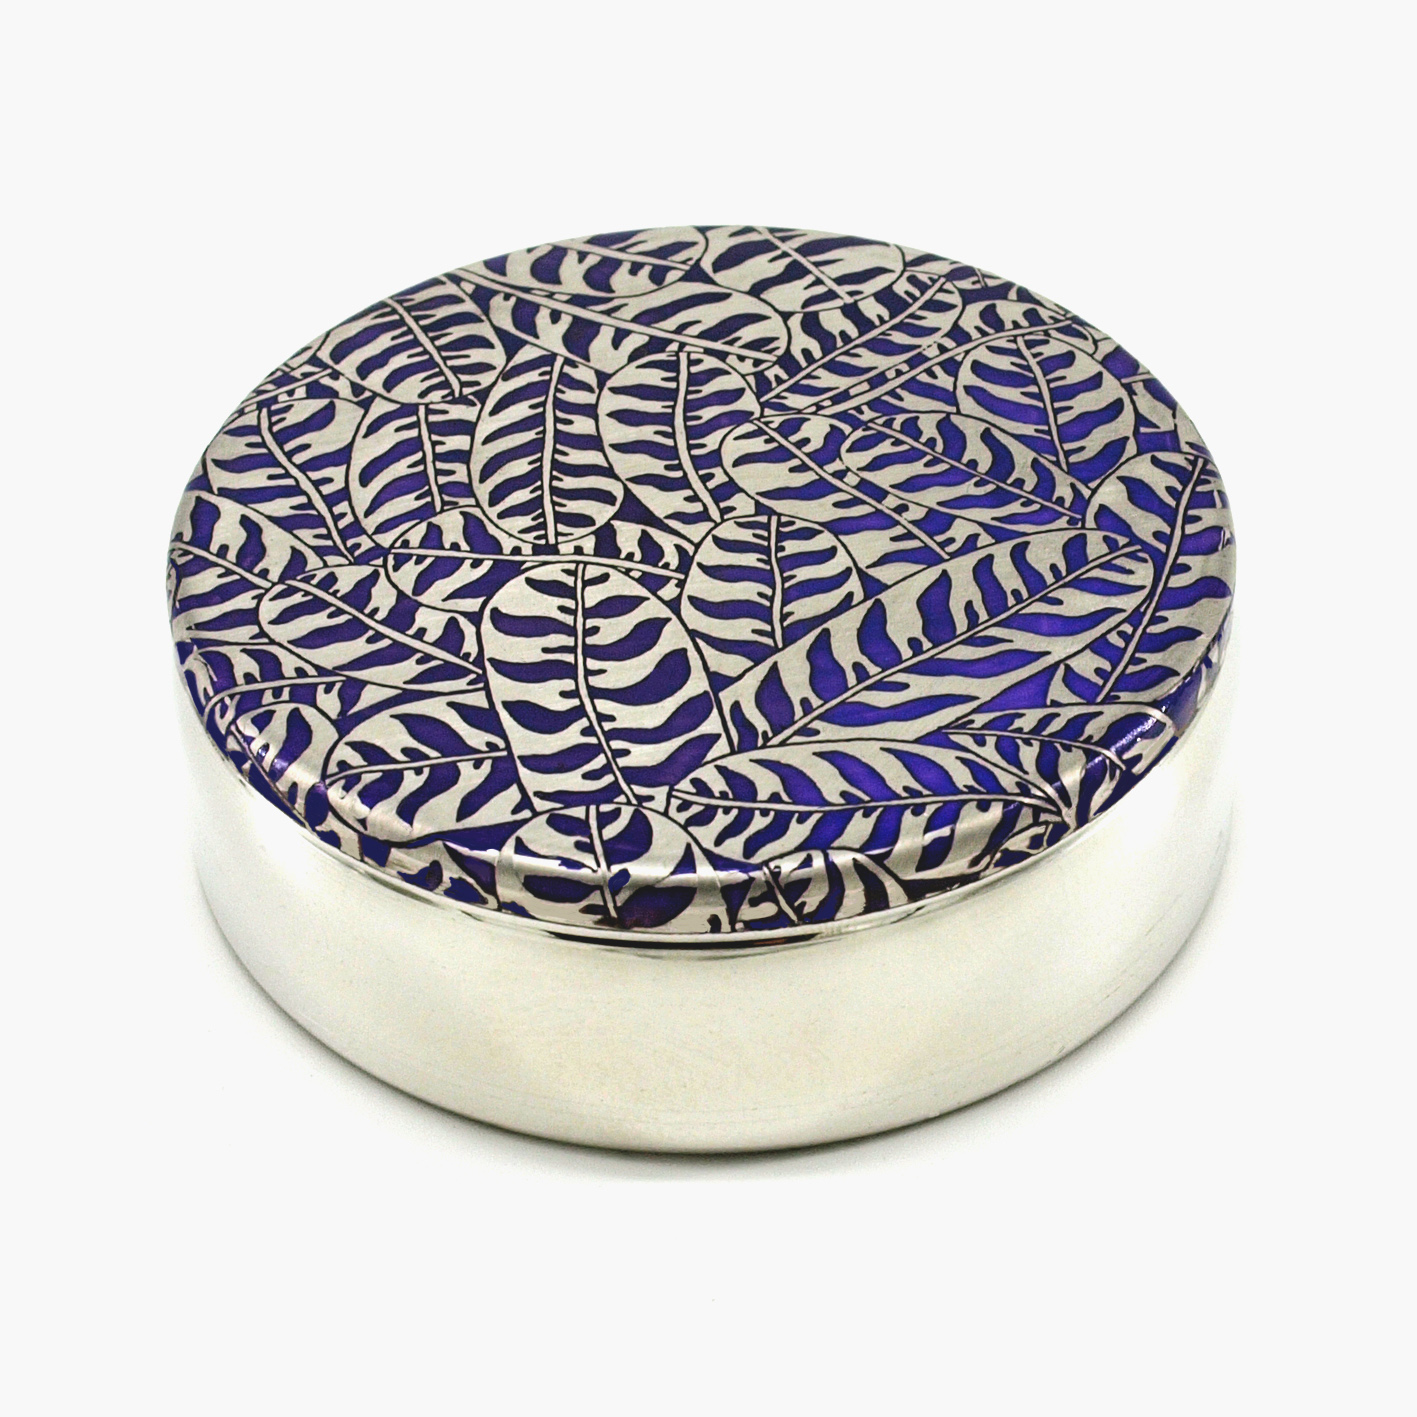 Tigerleaf_Purple_Box_8cm_W